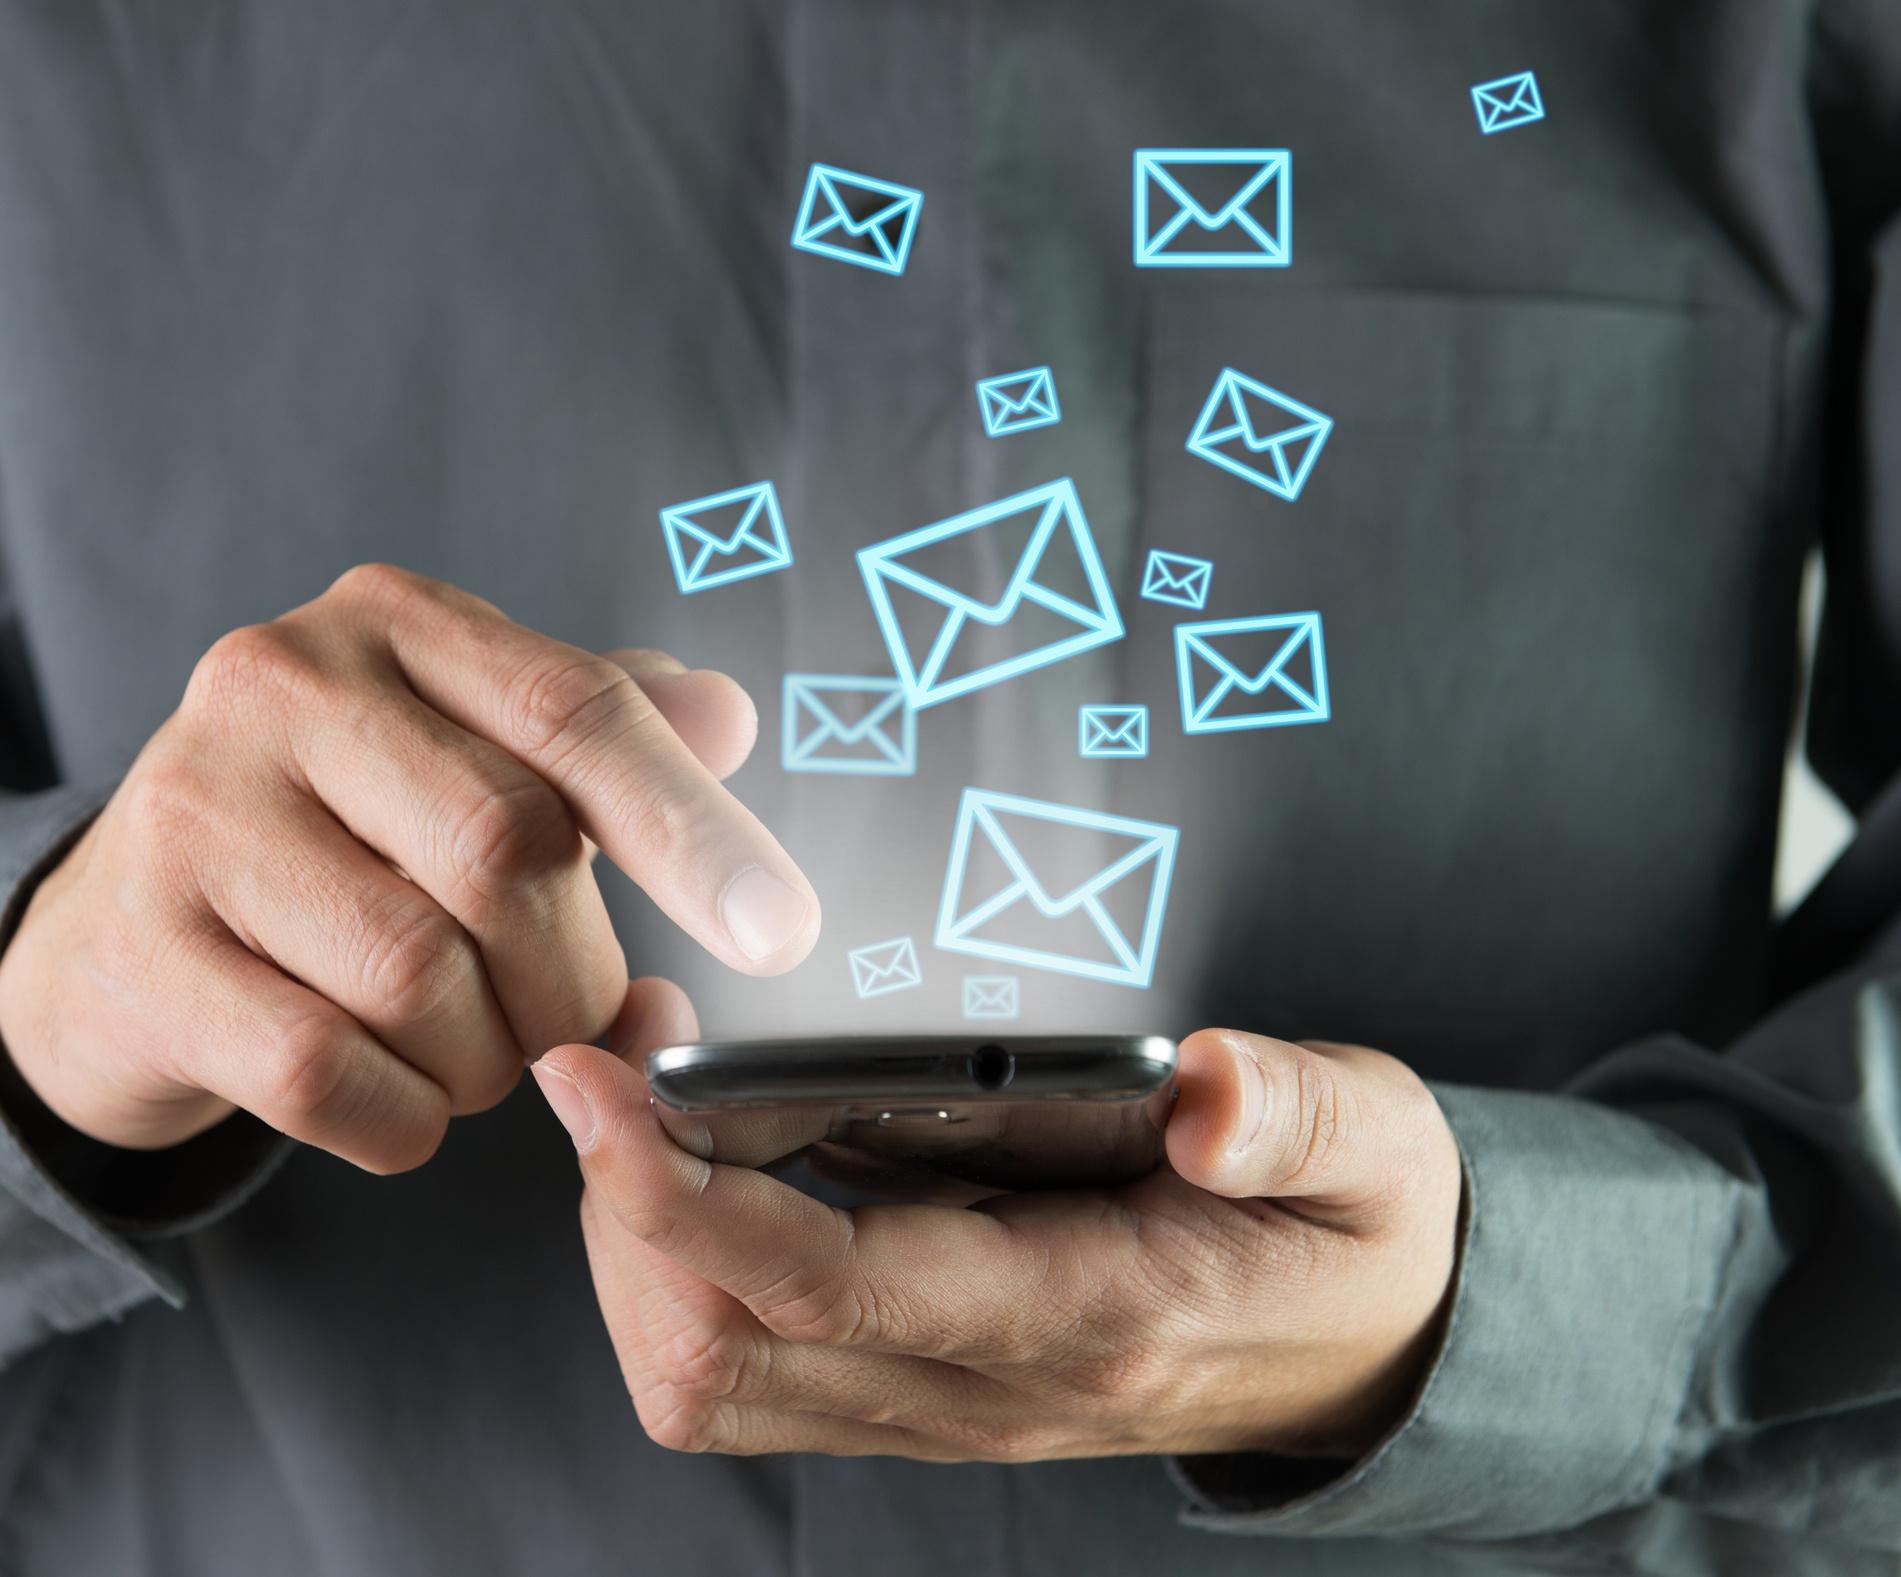 sistema de SMS